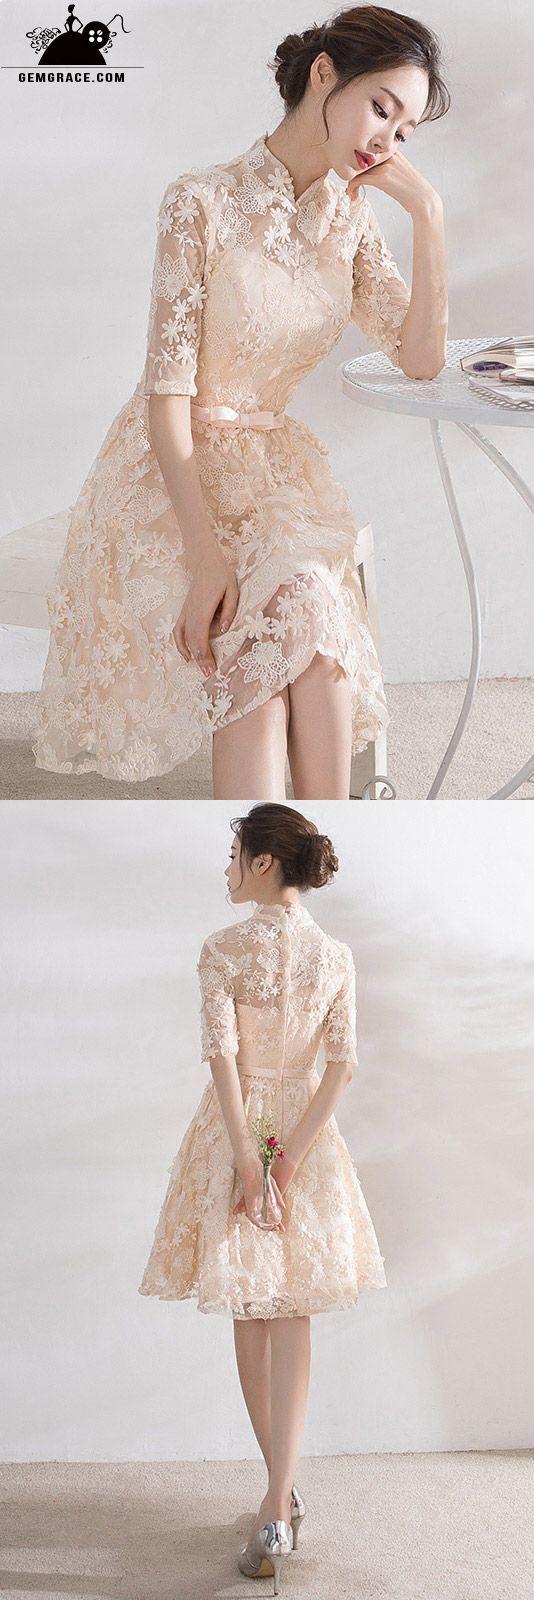 Simple Short Champagne Lace Wedding Party Dress With Collar Short Wedding Dress Simple Wedding Dress Short Dresses [ 1600 x 534 Pixel ]